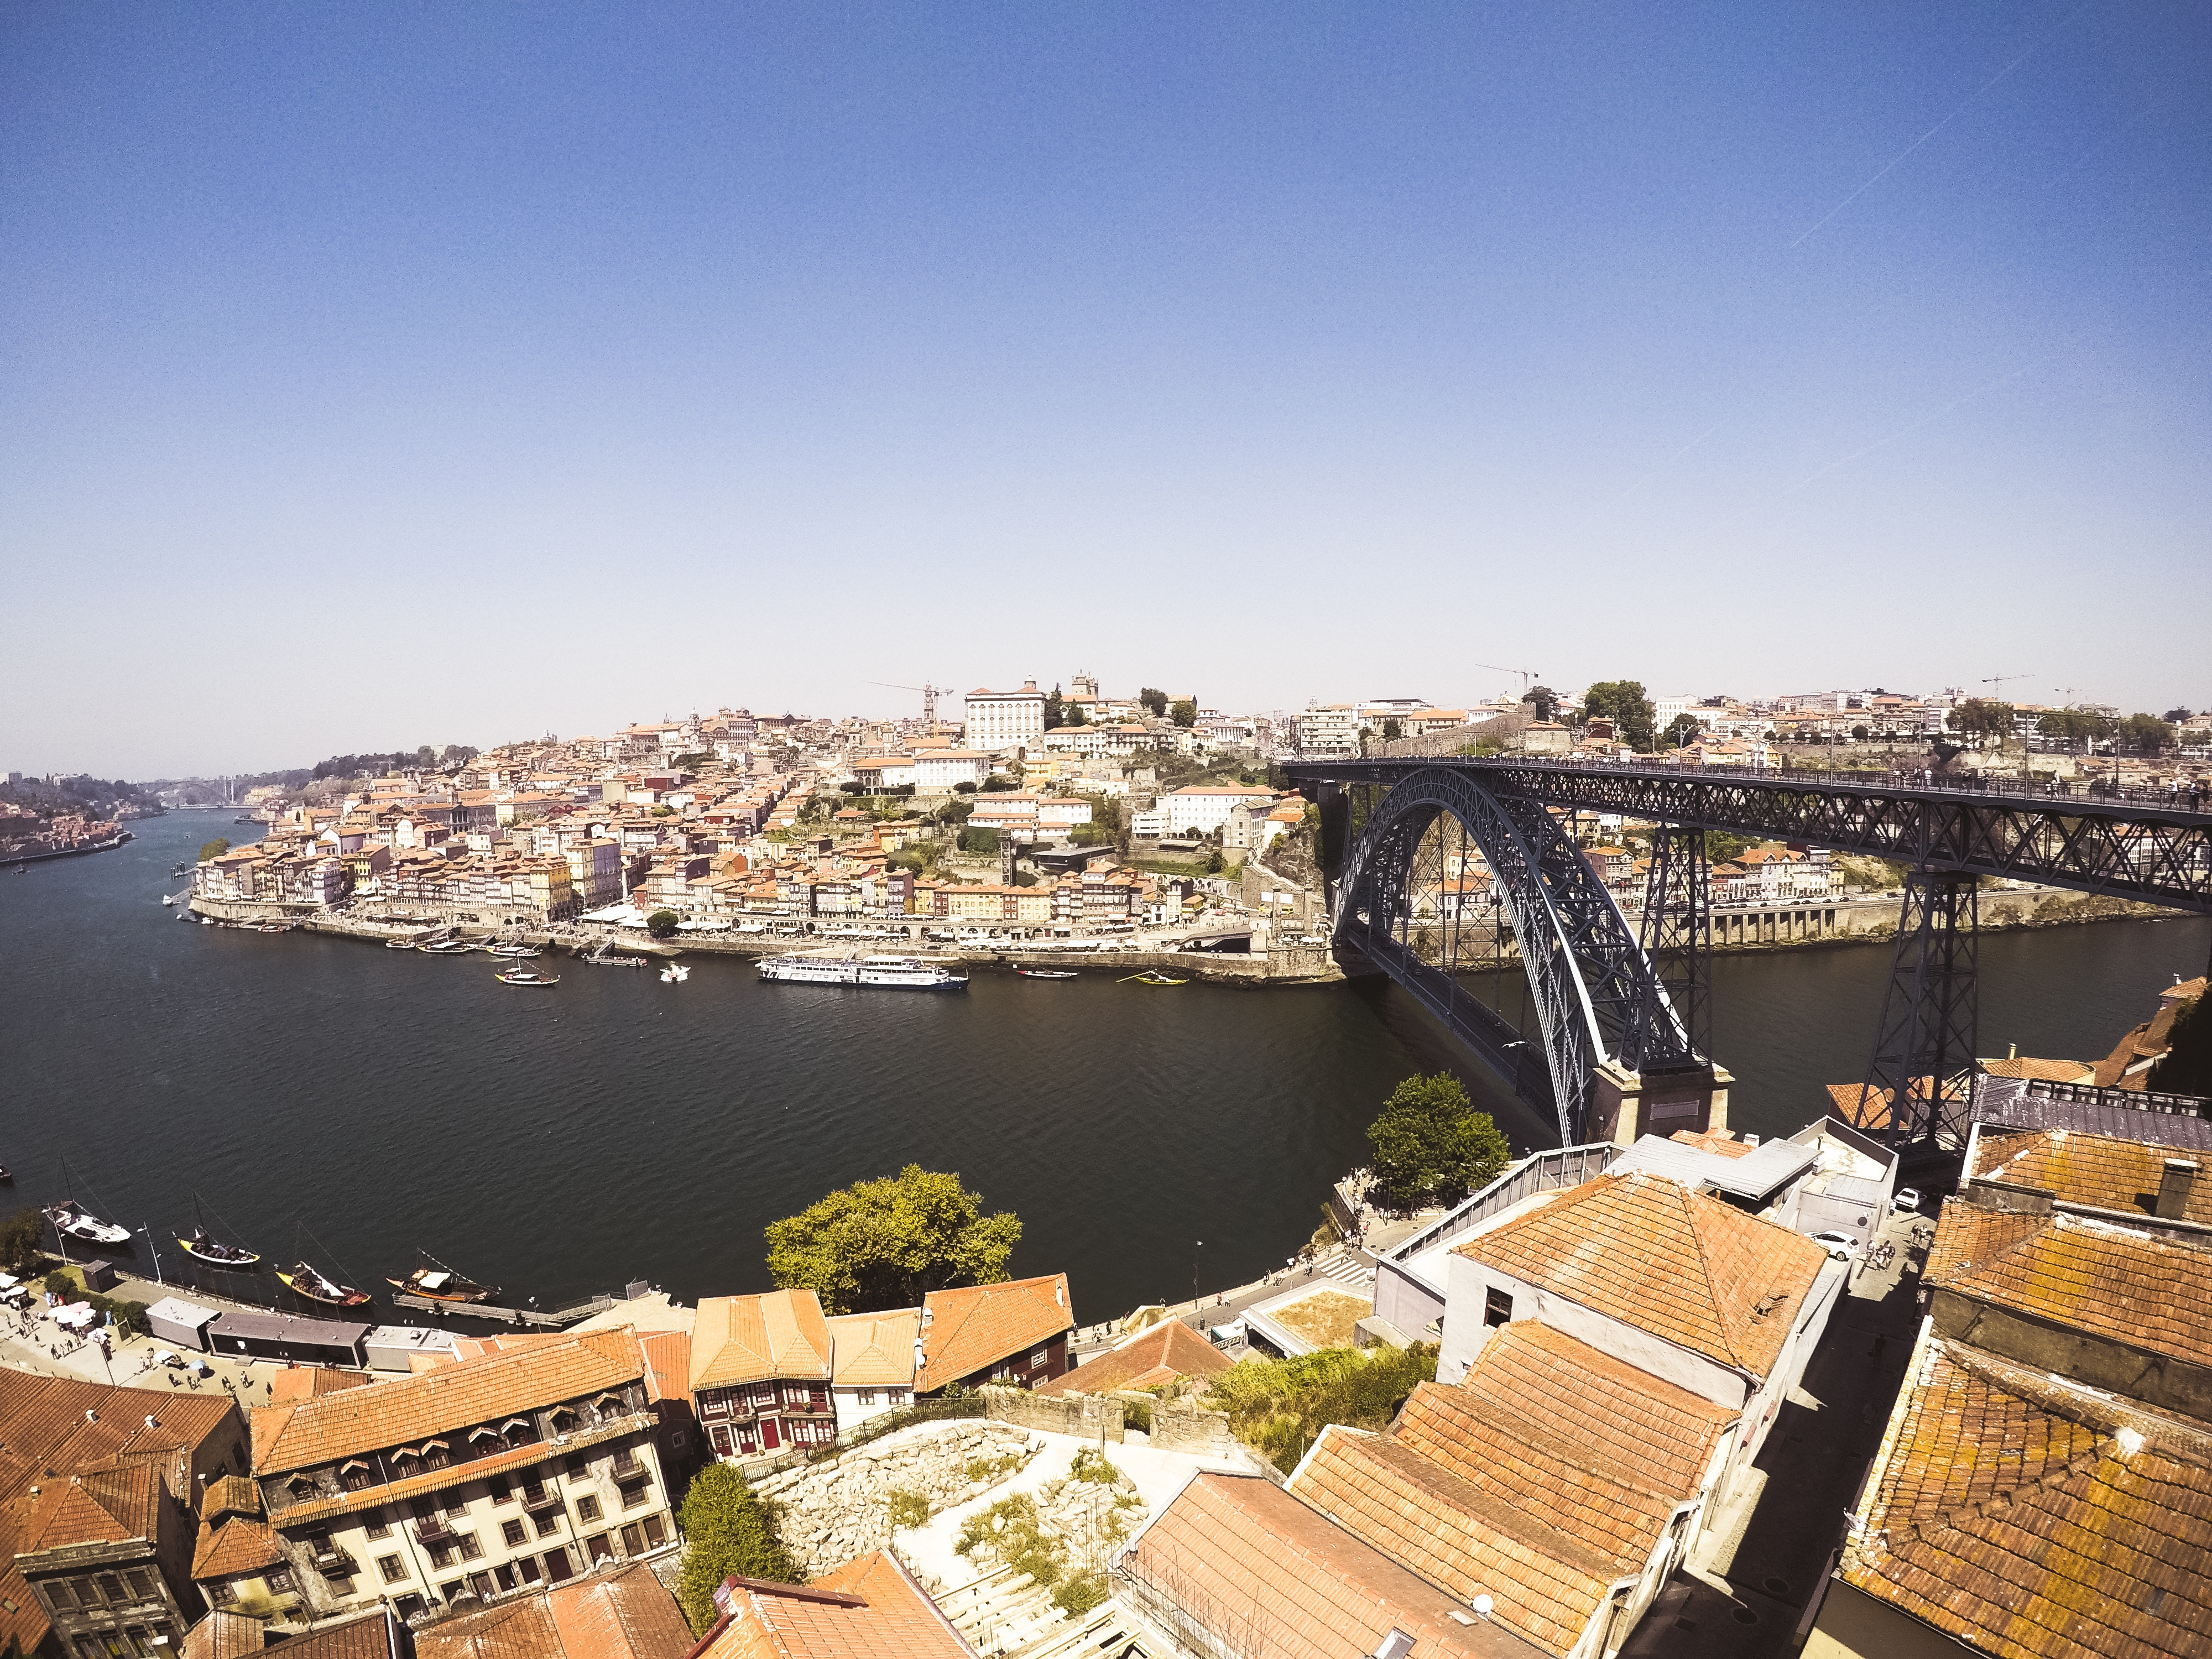 Vista panorâmica da cidade do Porto / Sadie Teper/Unsplash